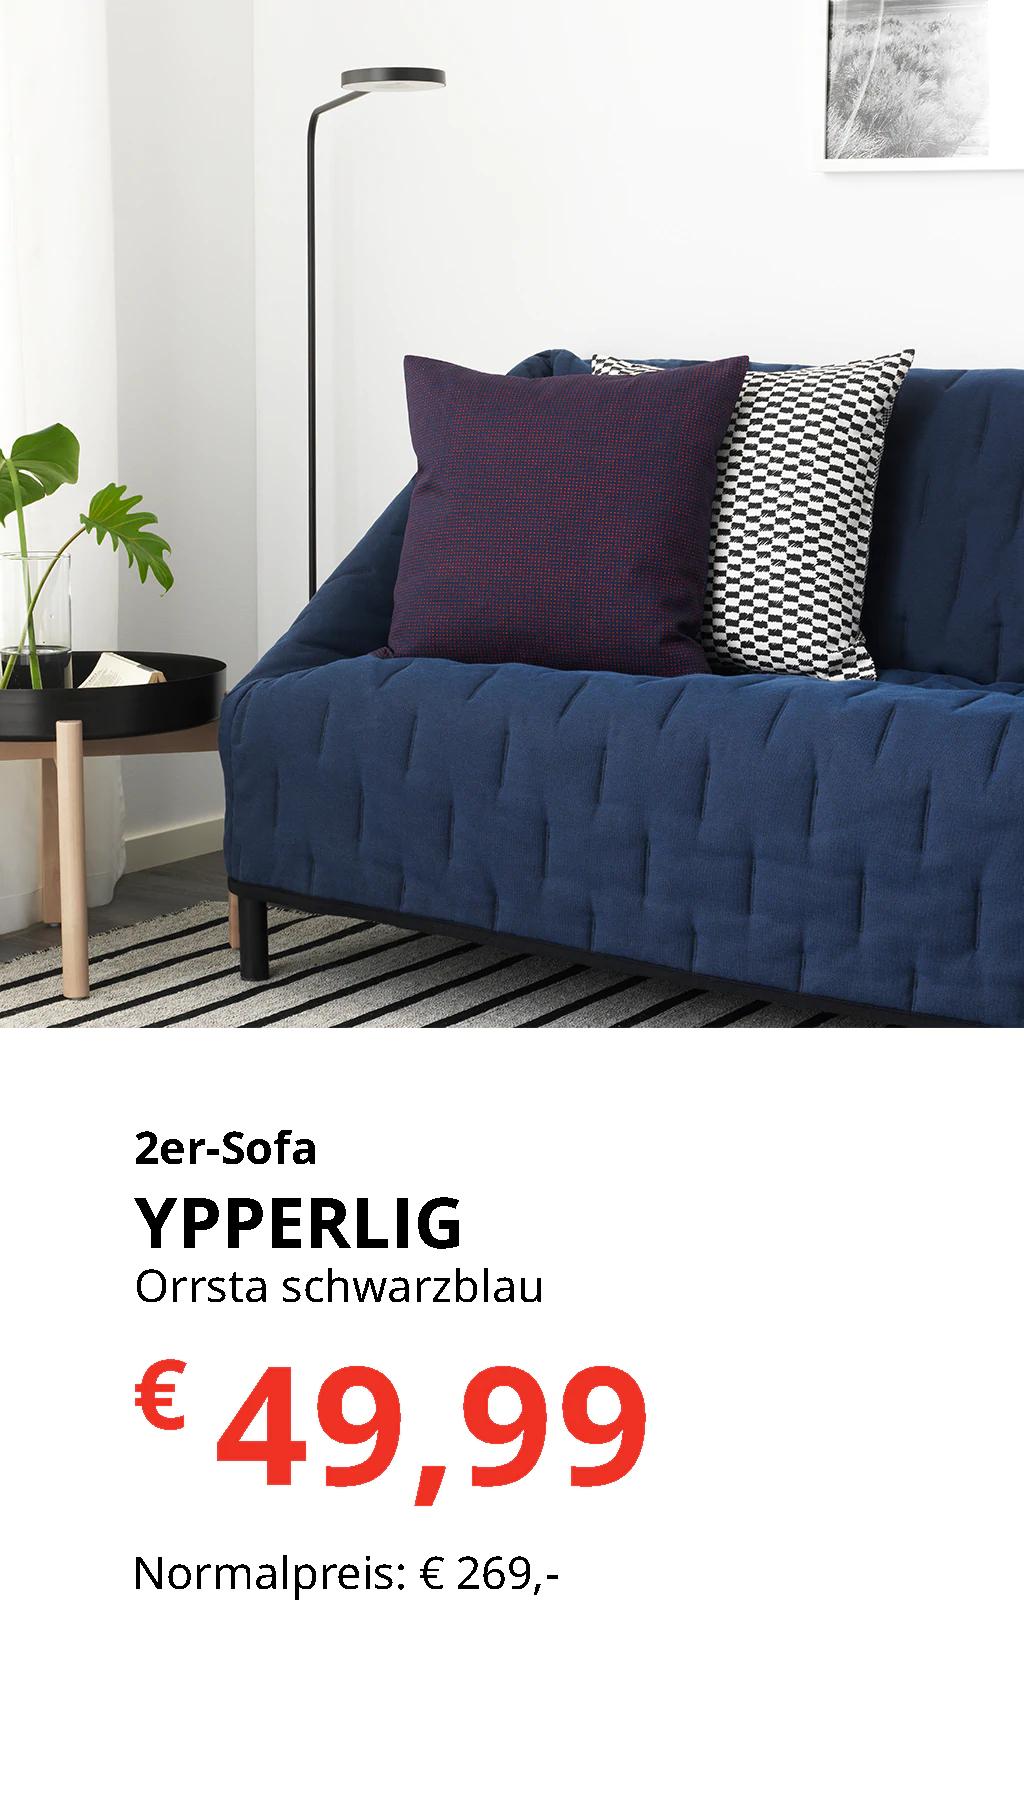 Ypperlig Sofa Ikea Vösendorf